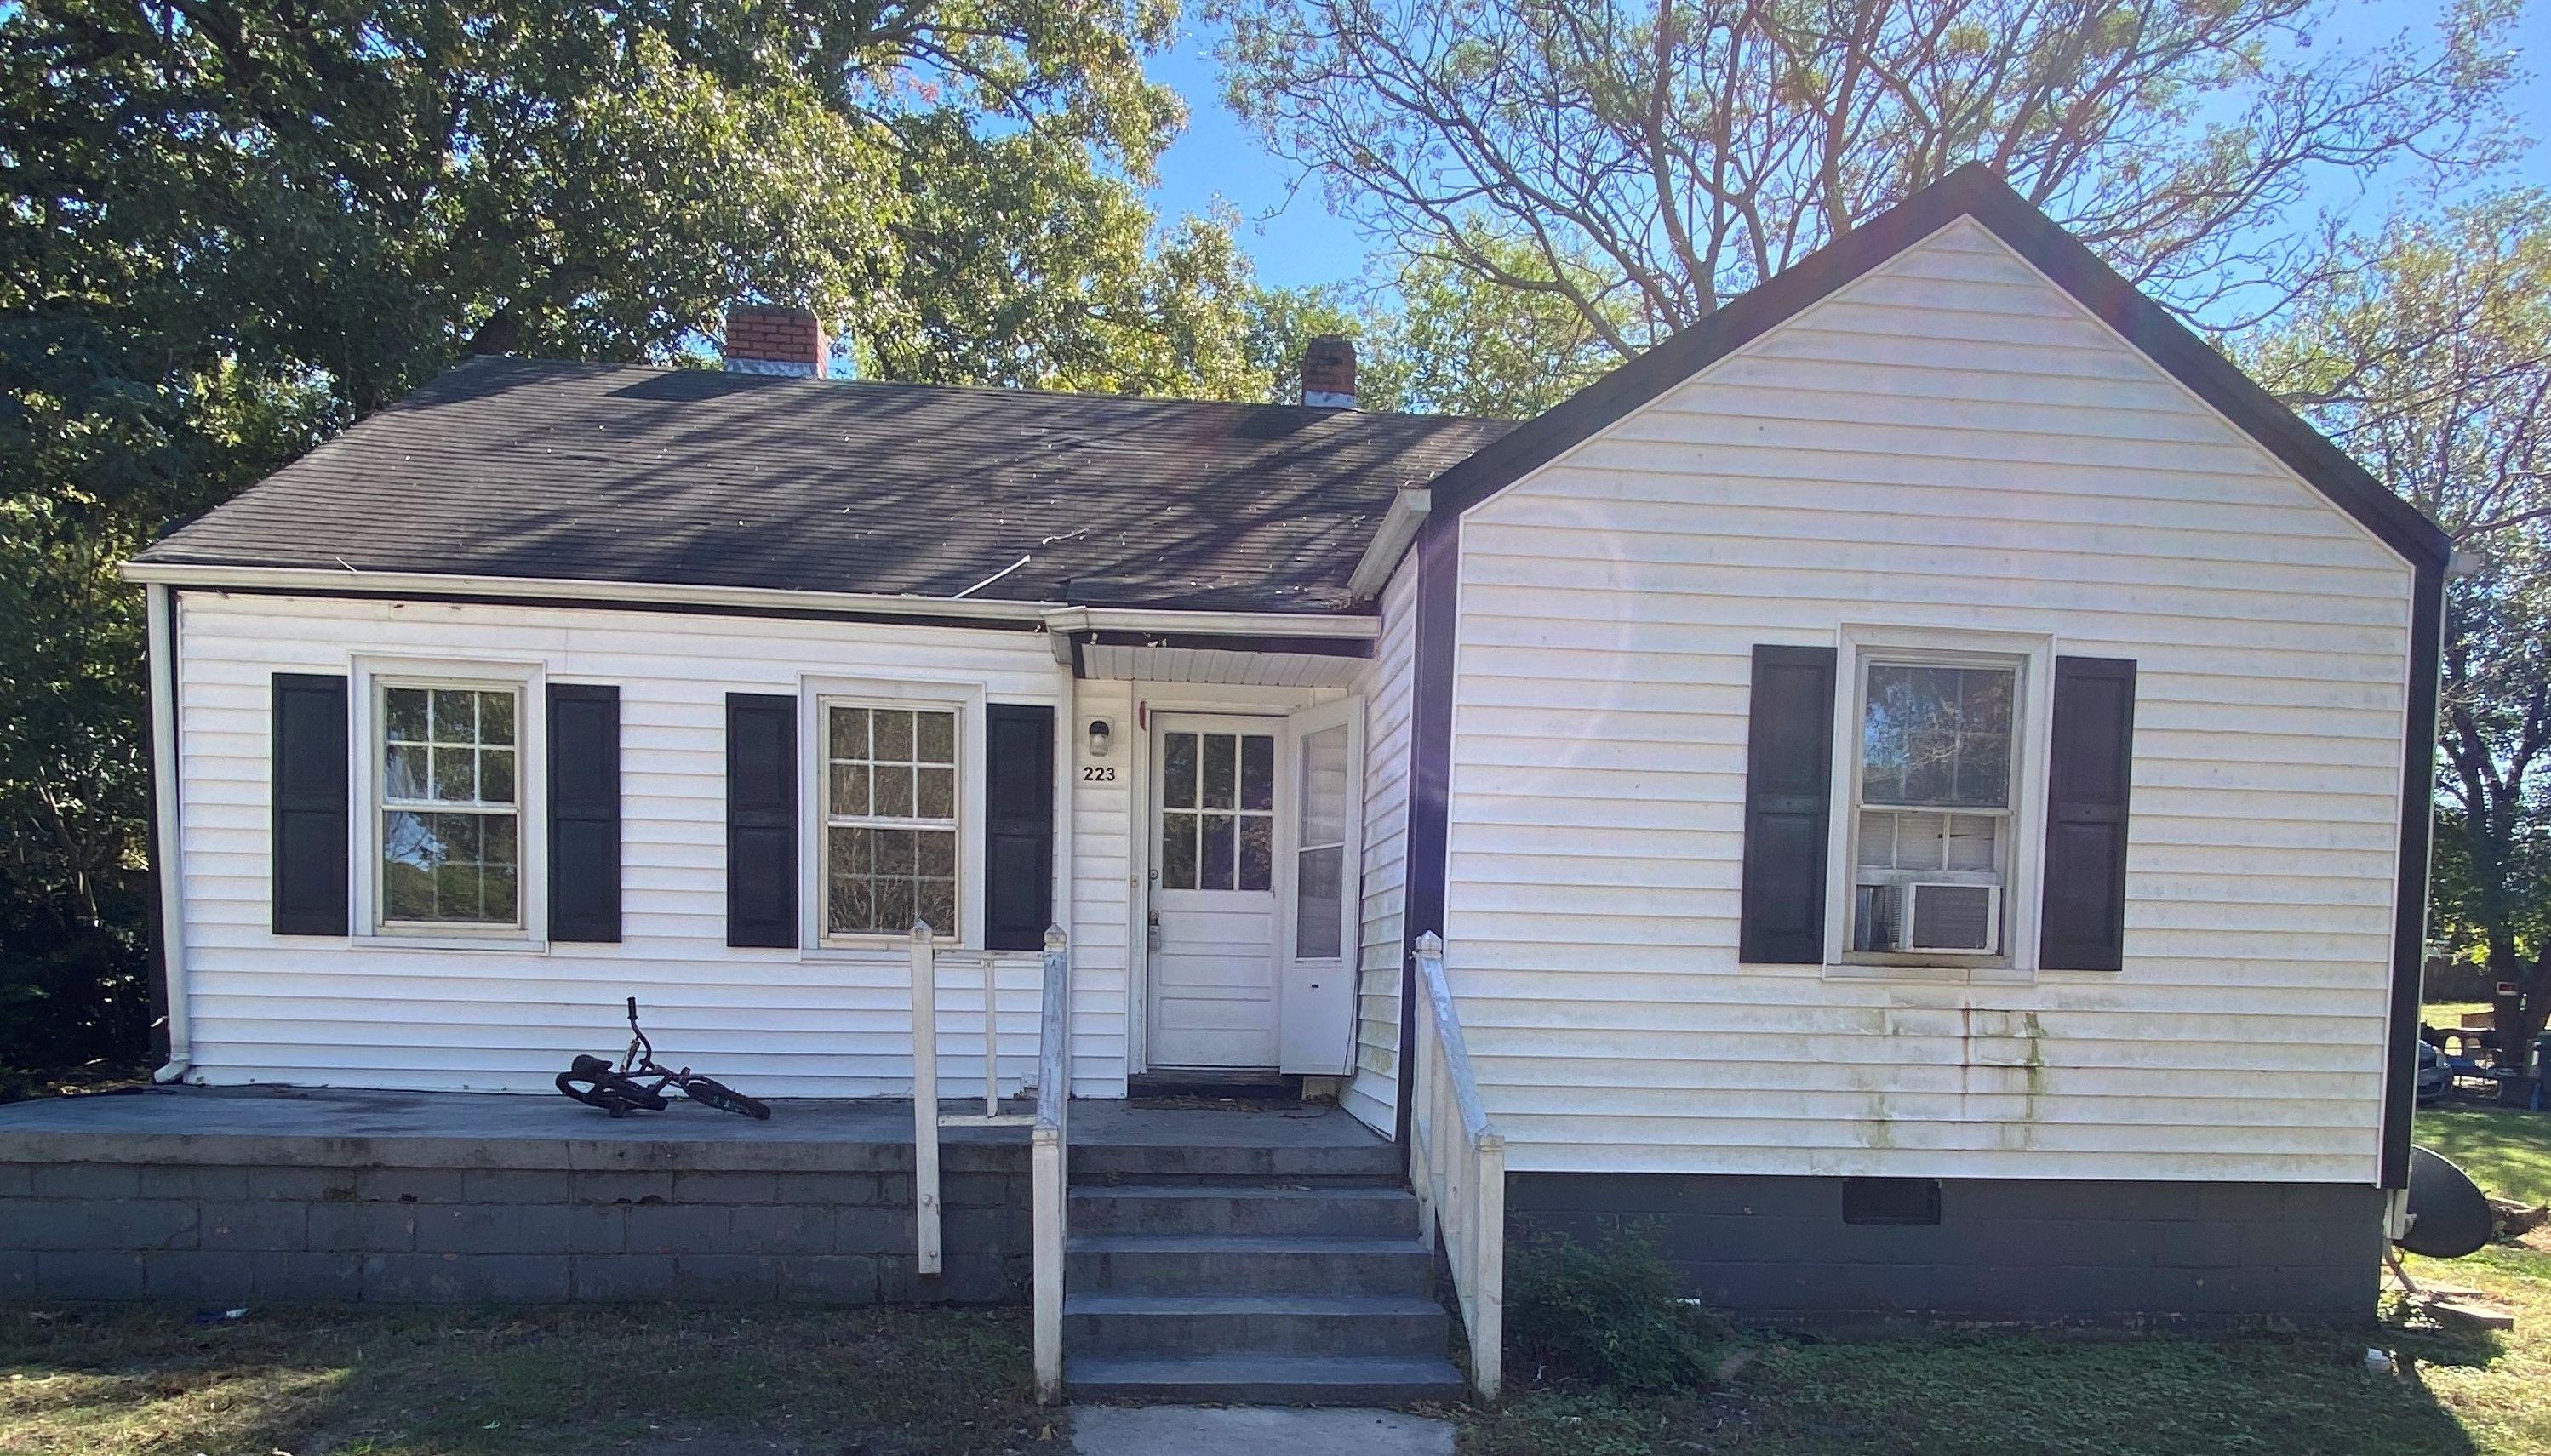 223 W Barbee St, Zebulon, NC